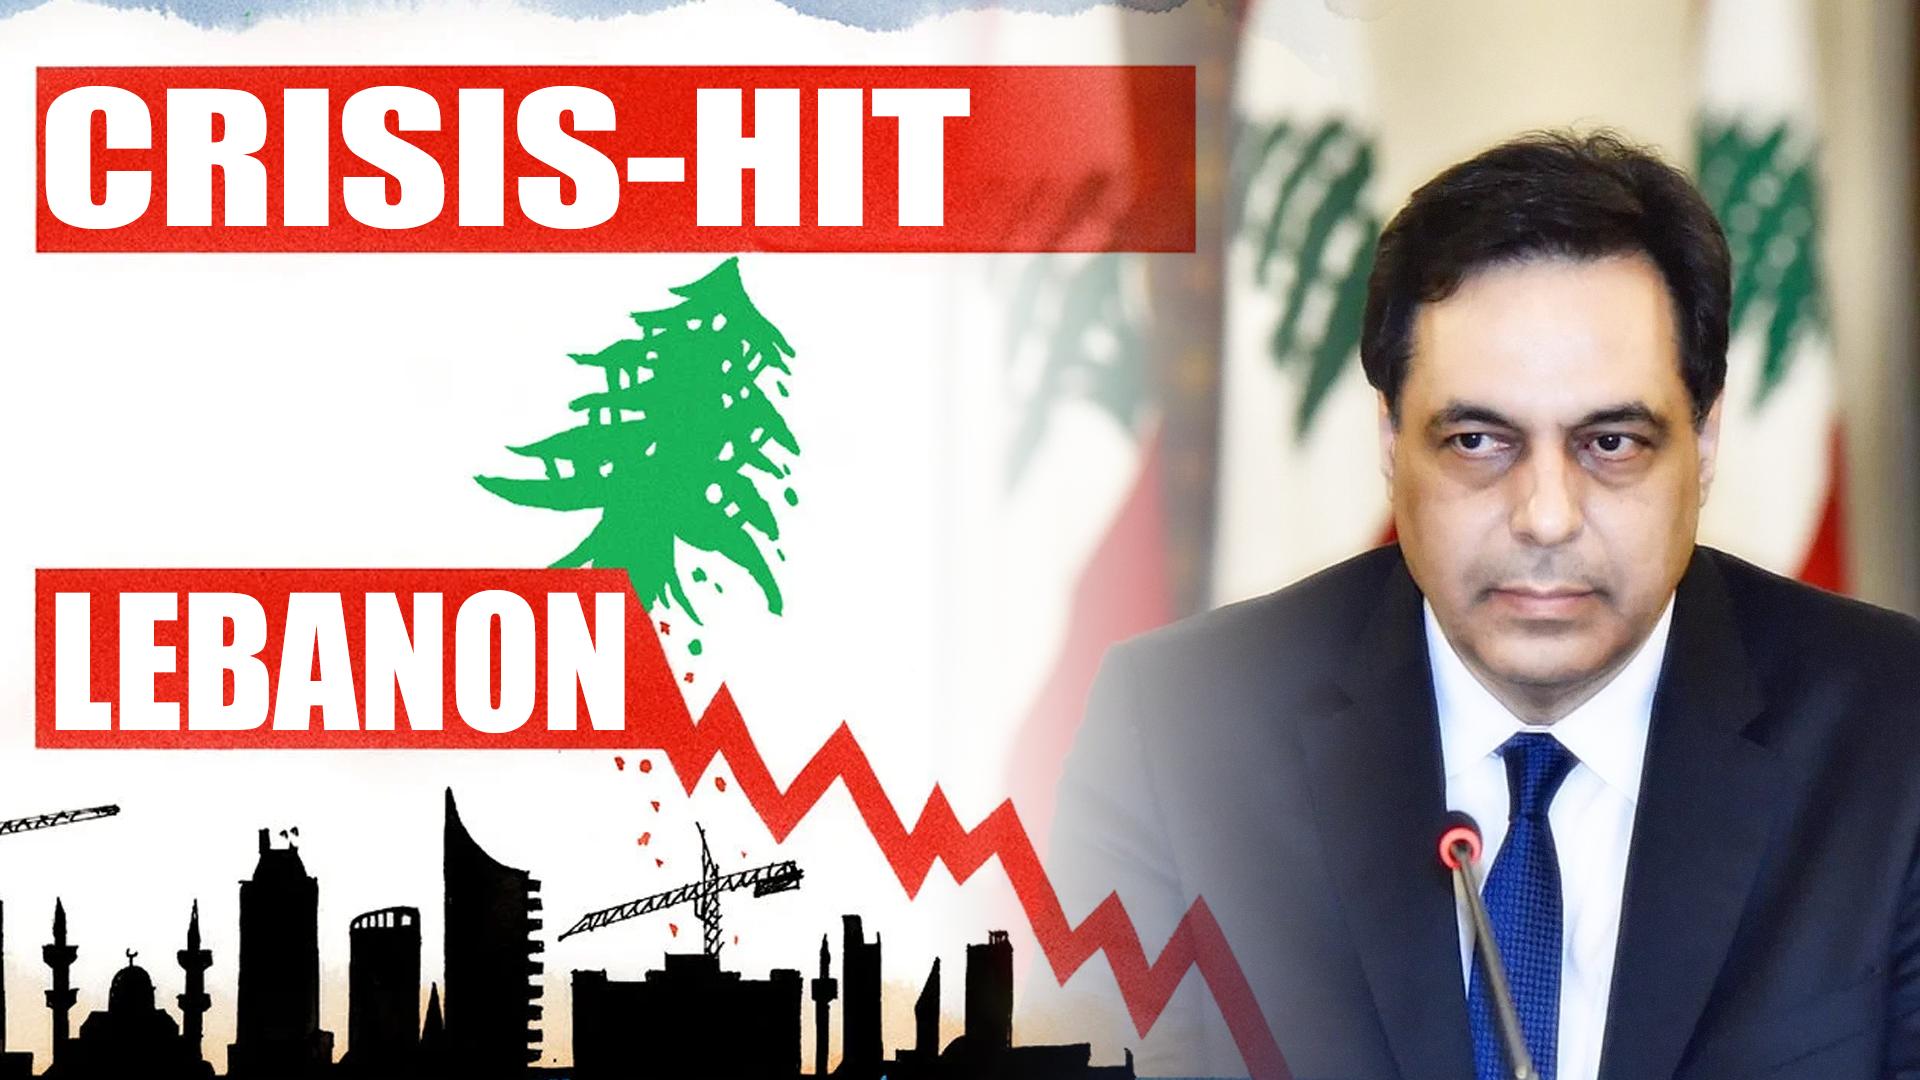 Lebanon's political and economic crisis